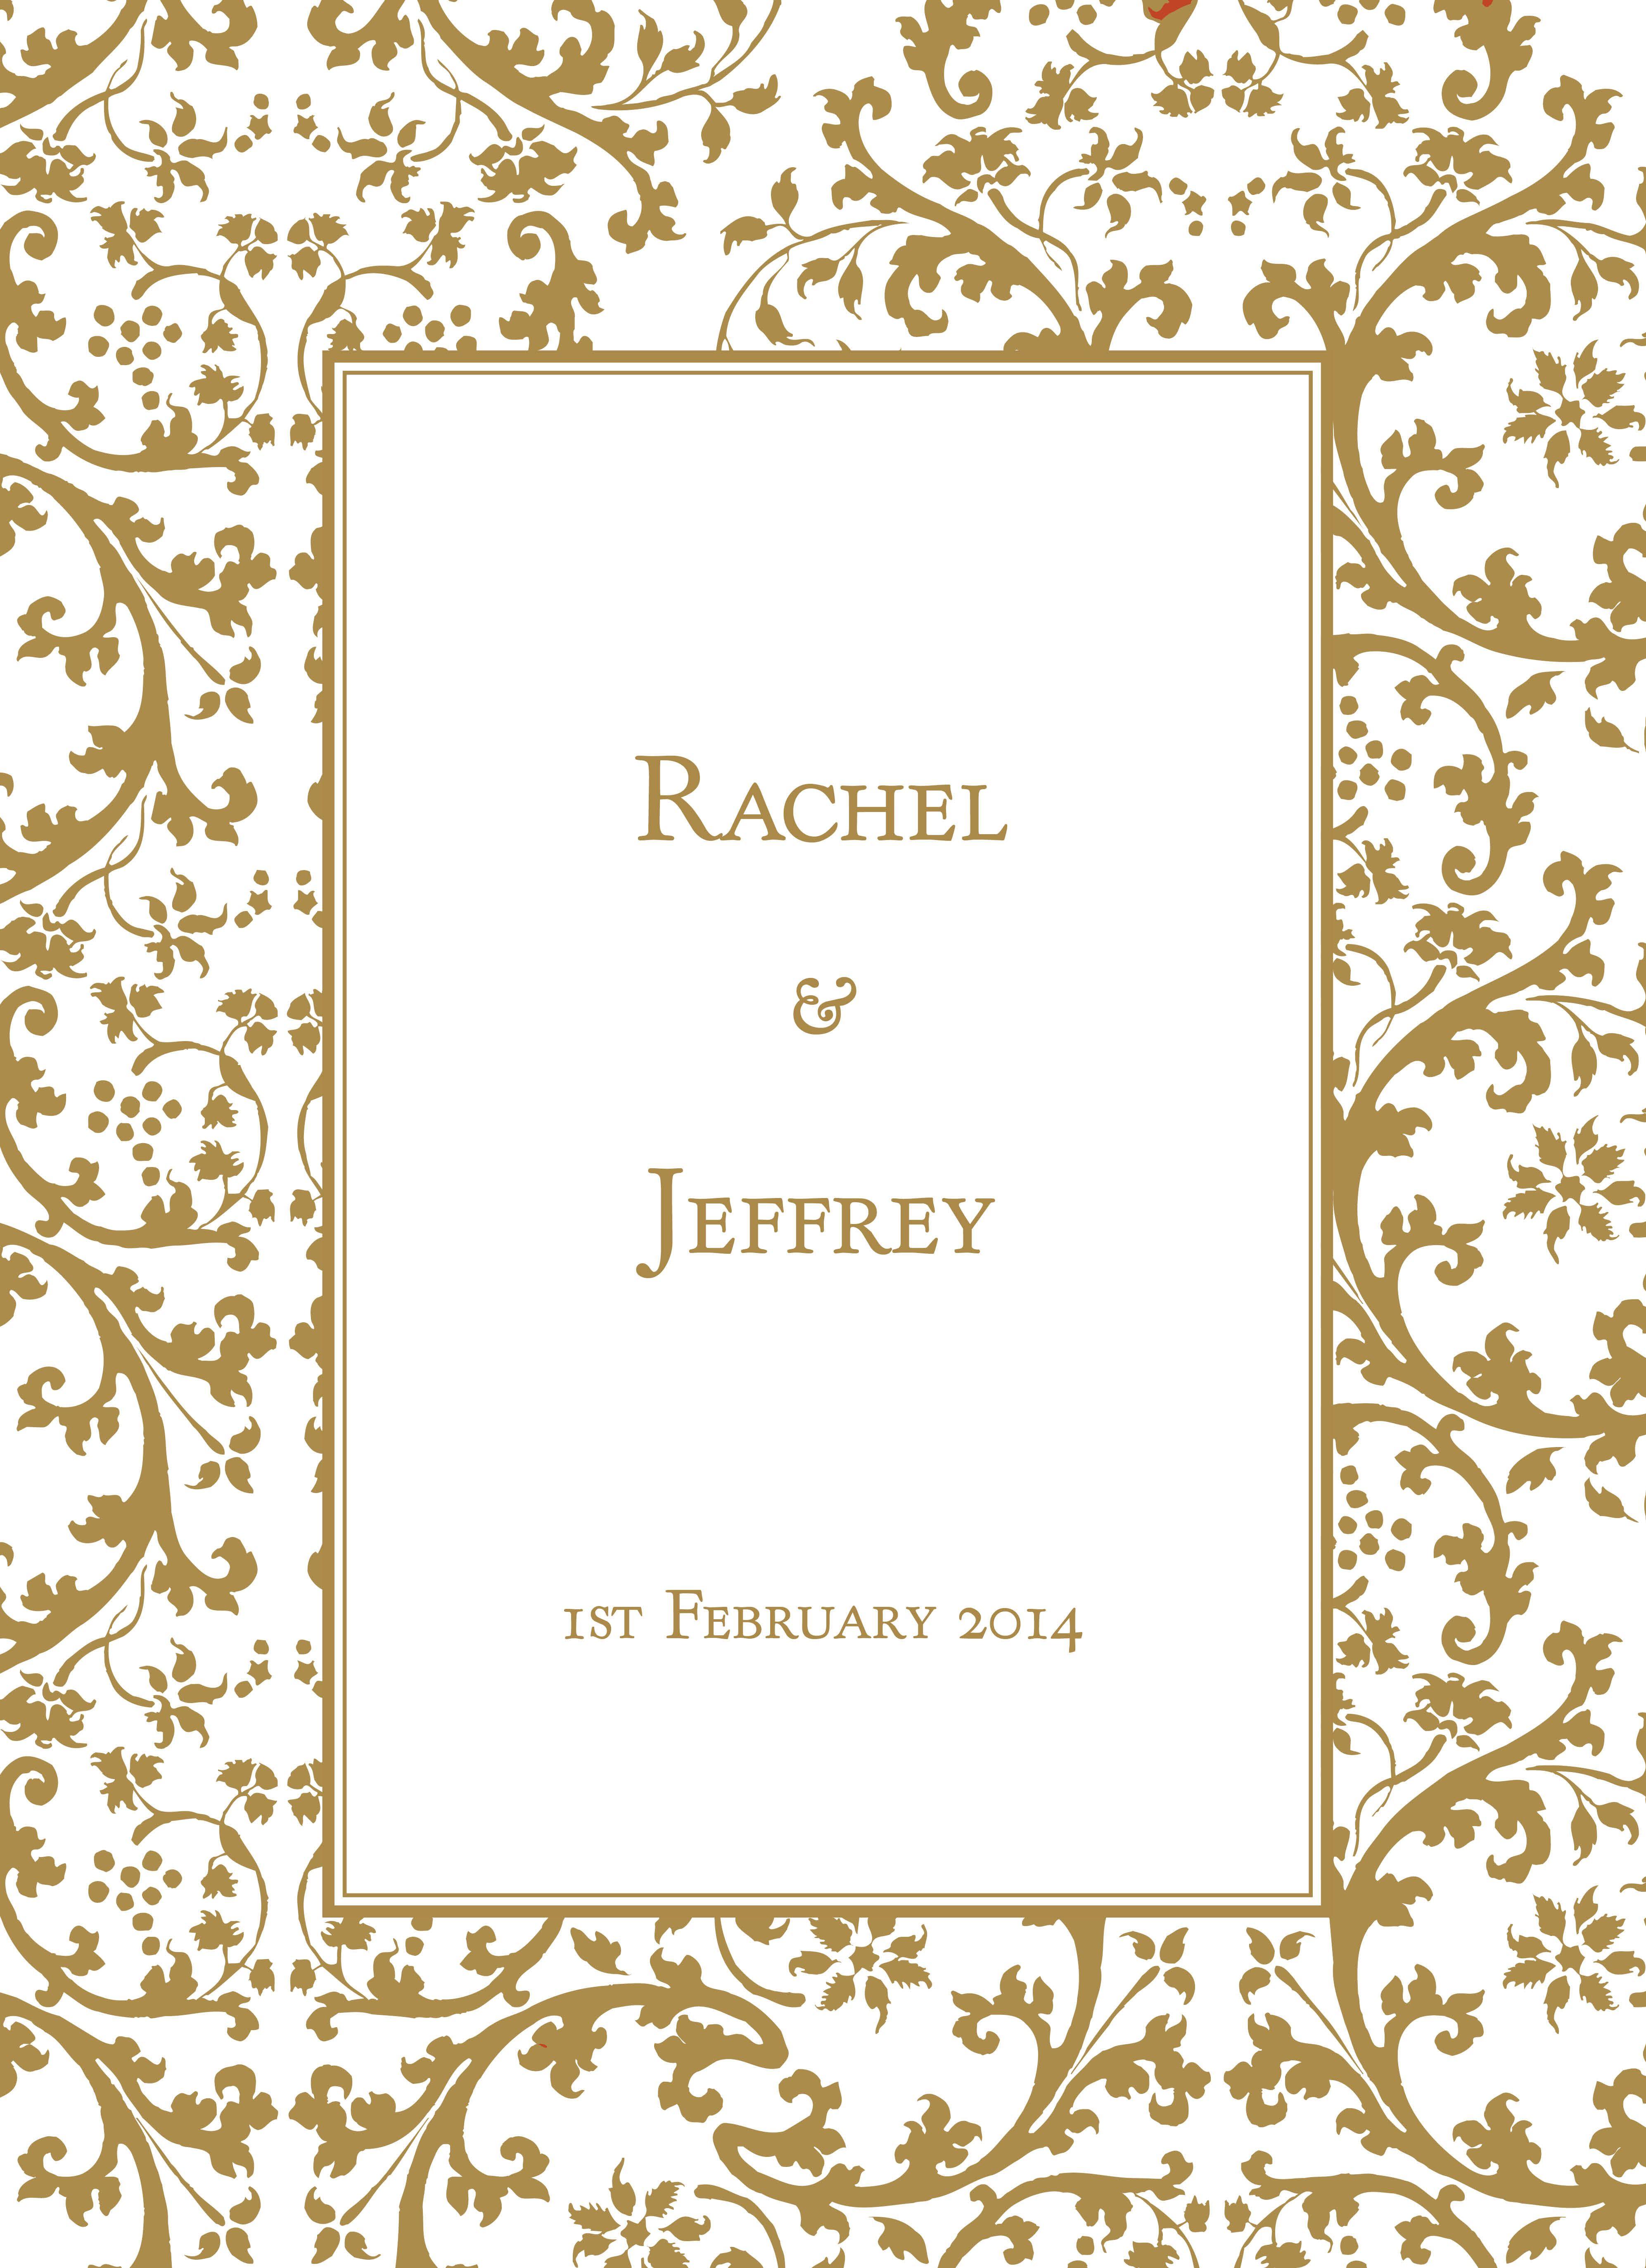 wedding invitations borders gold dreamday invitations gold leaf ...